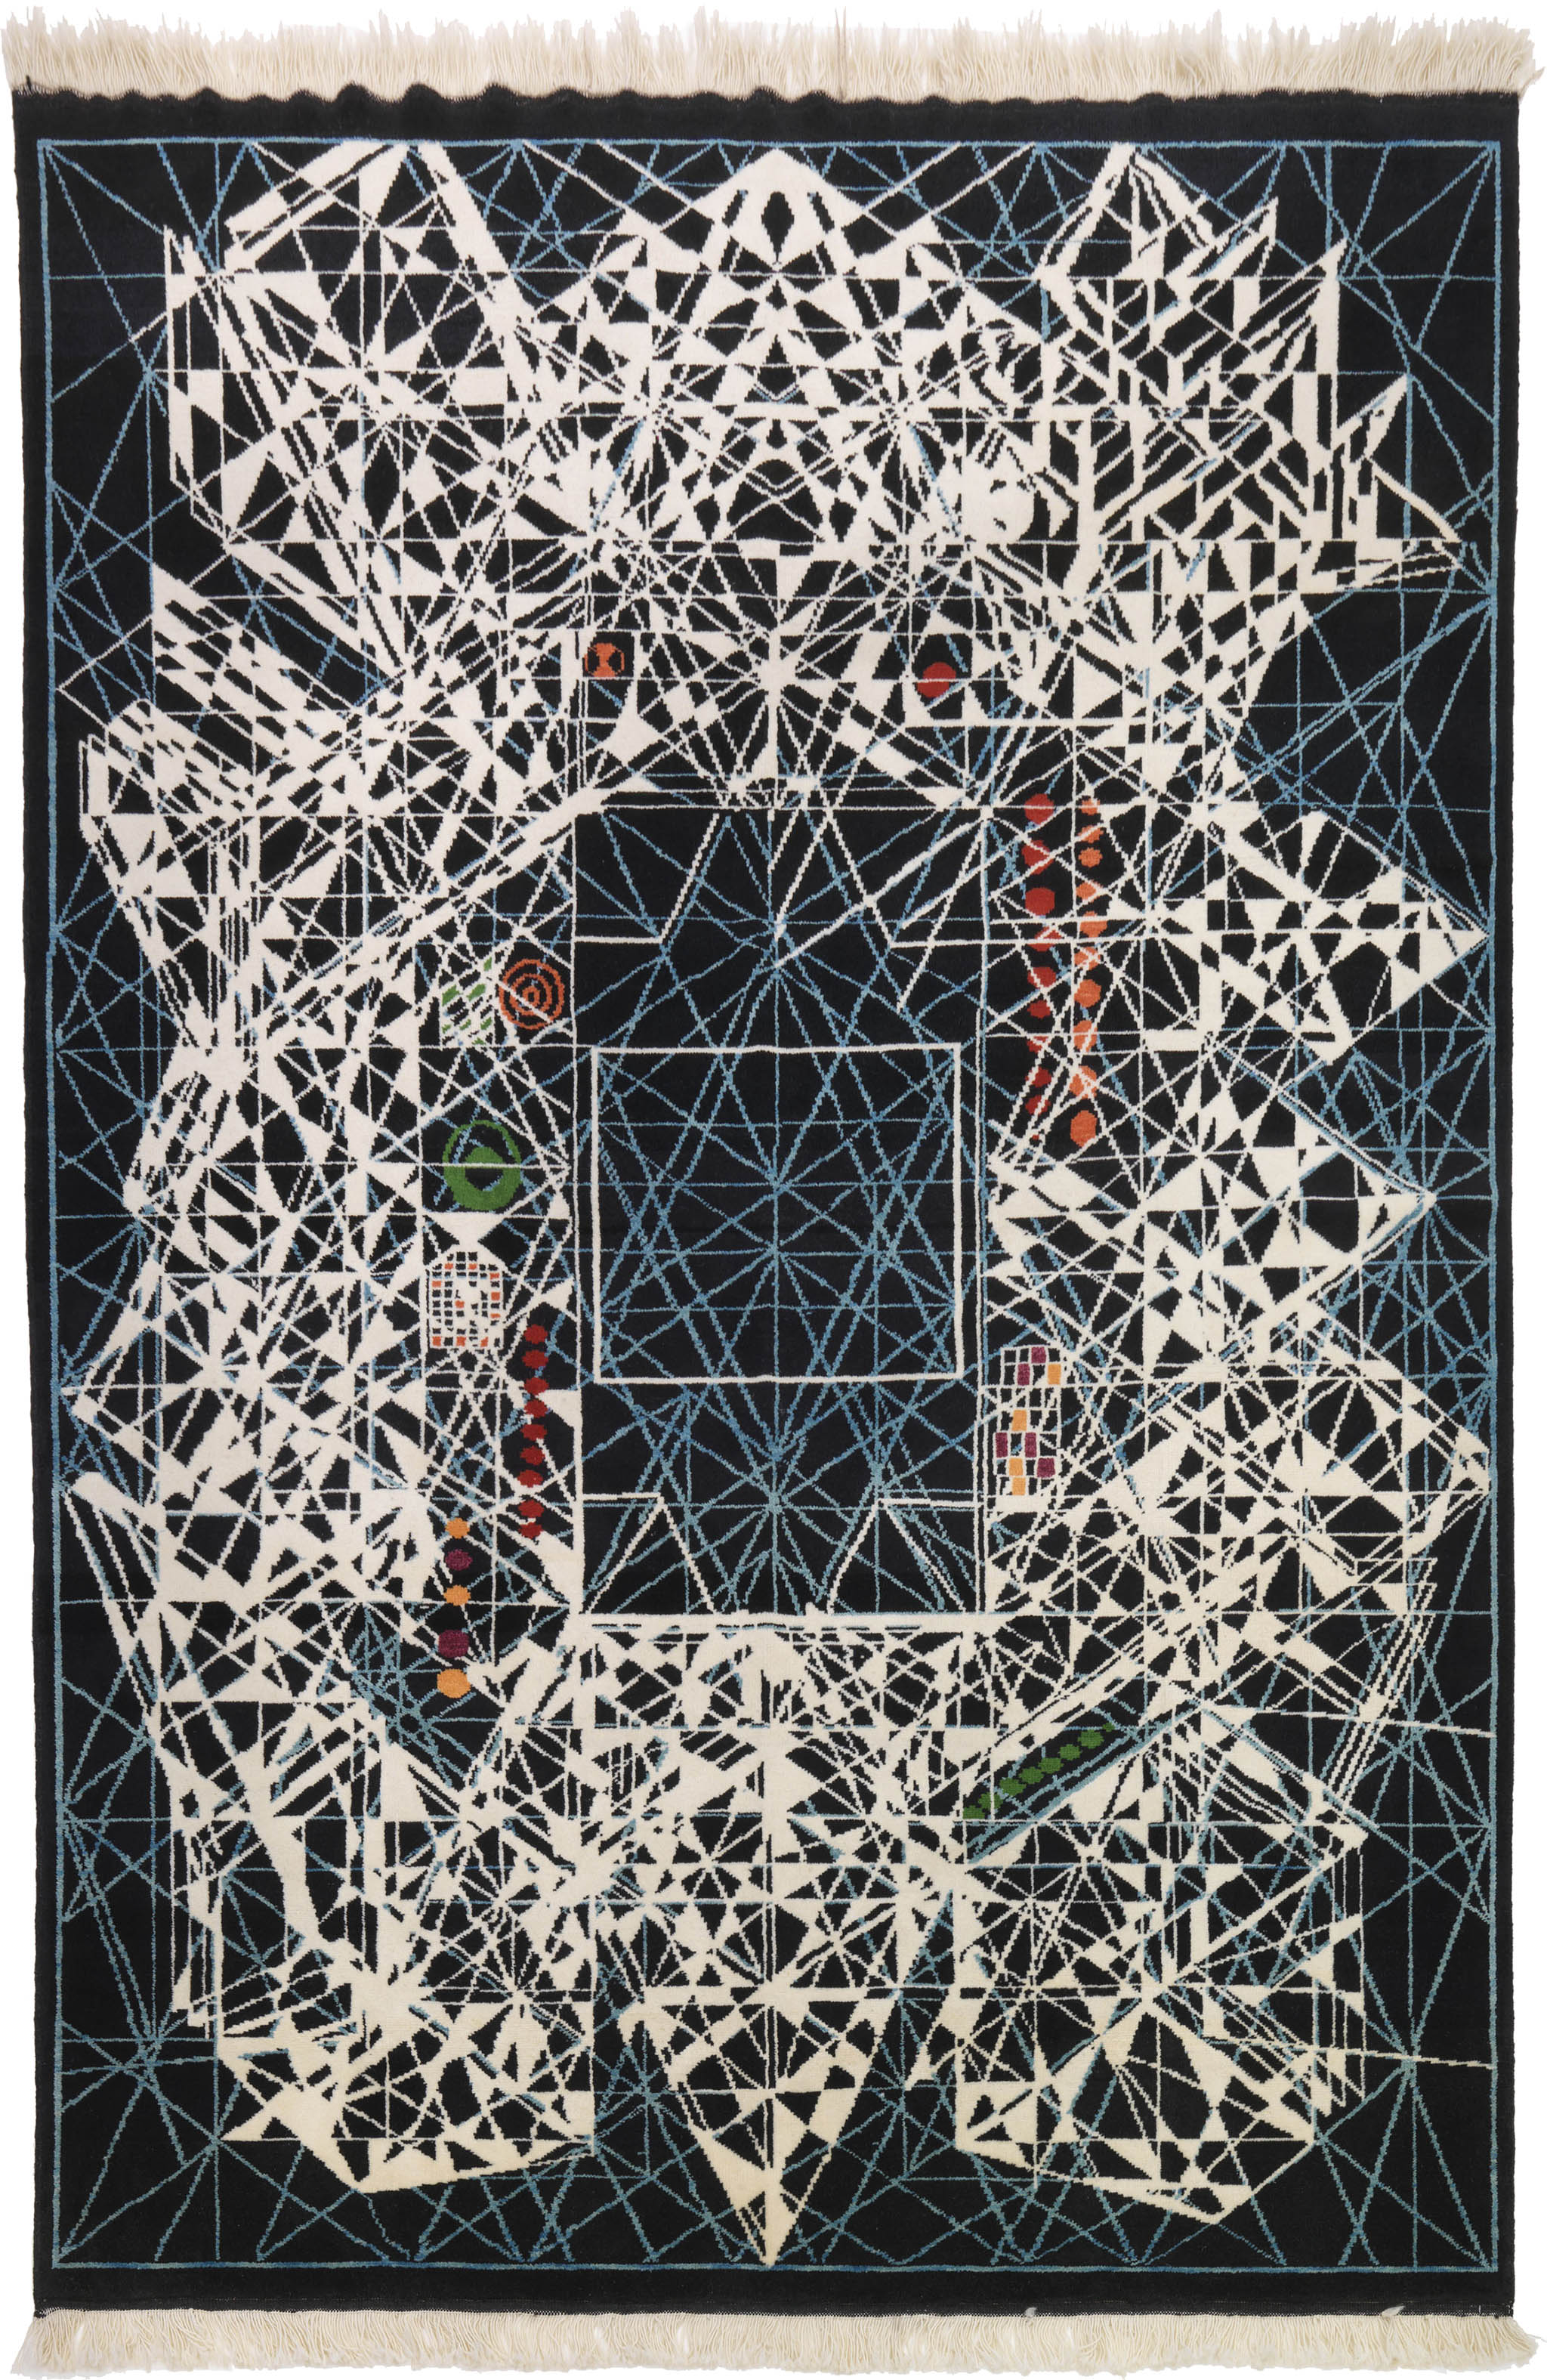 "'Mars' carpet by Viron Erol Vert sized 2.00m x 3.00m (6'7"" x 9'10""), circa 2012. | Image courtesy of Viron Erol Vert."